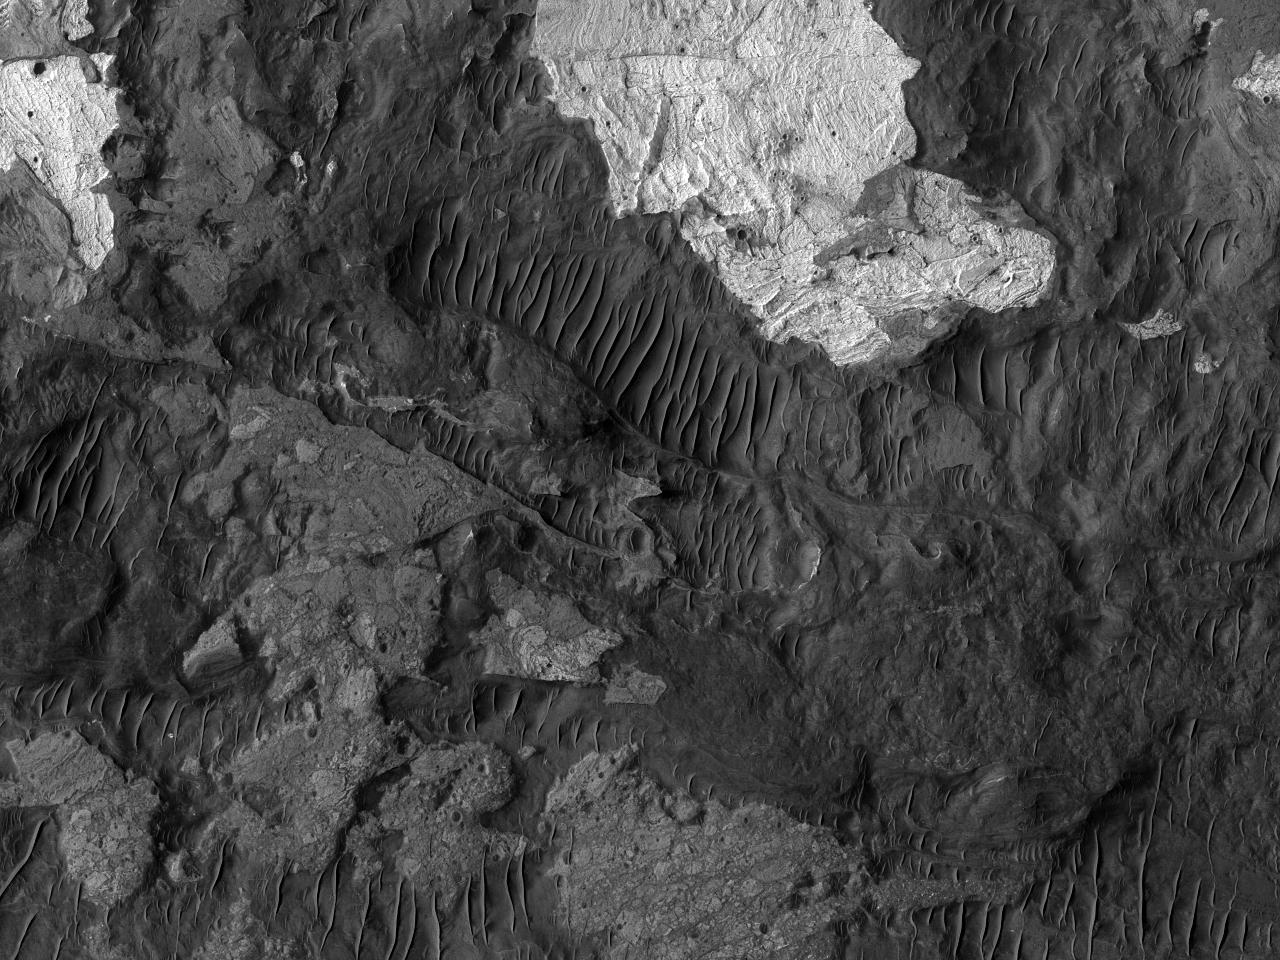 Обнажения светлого цвета на дне каньона Ius Chasma